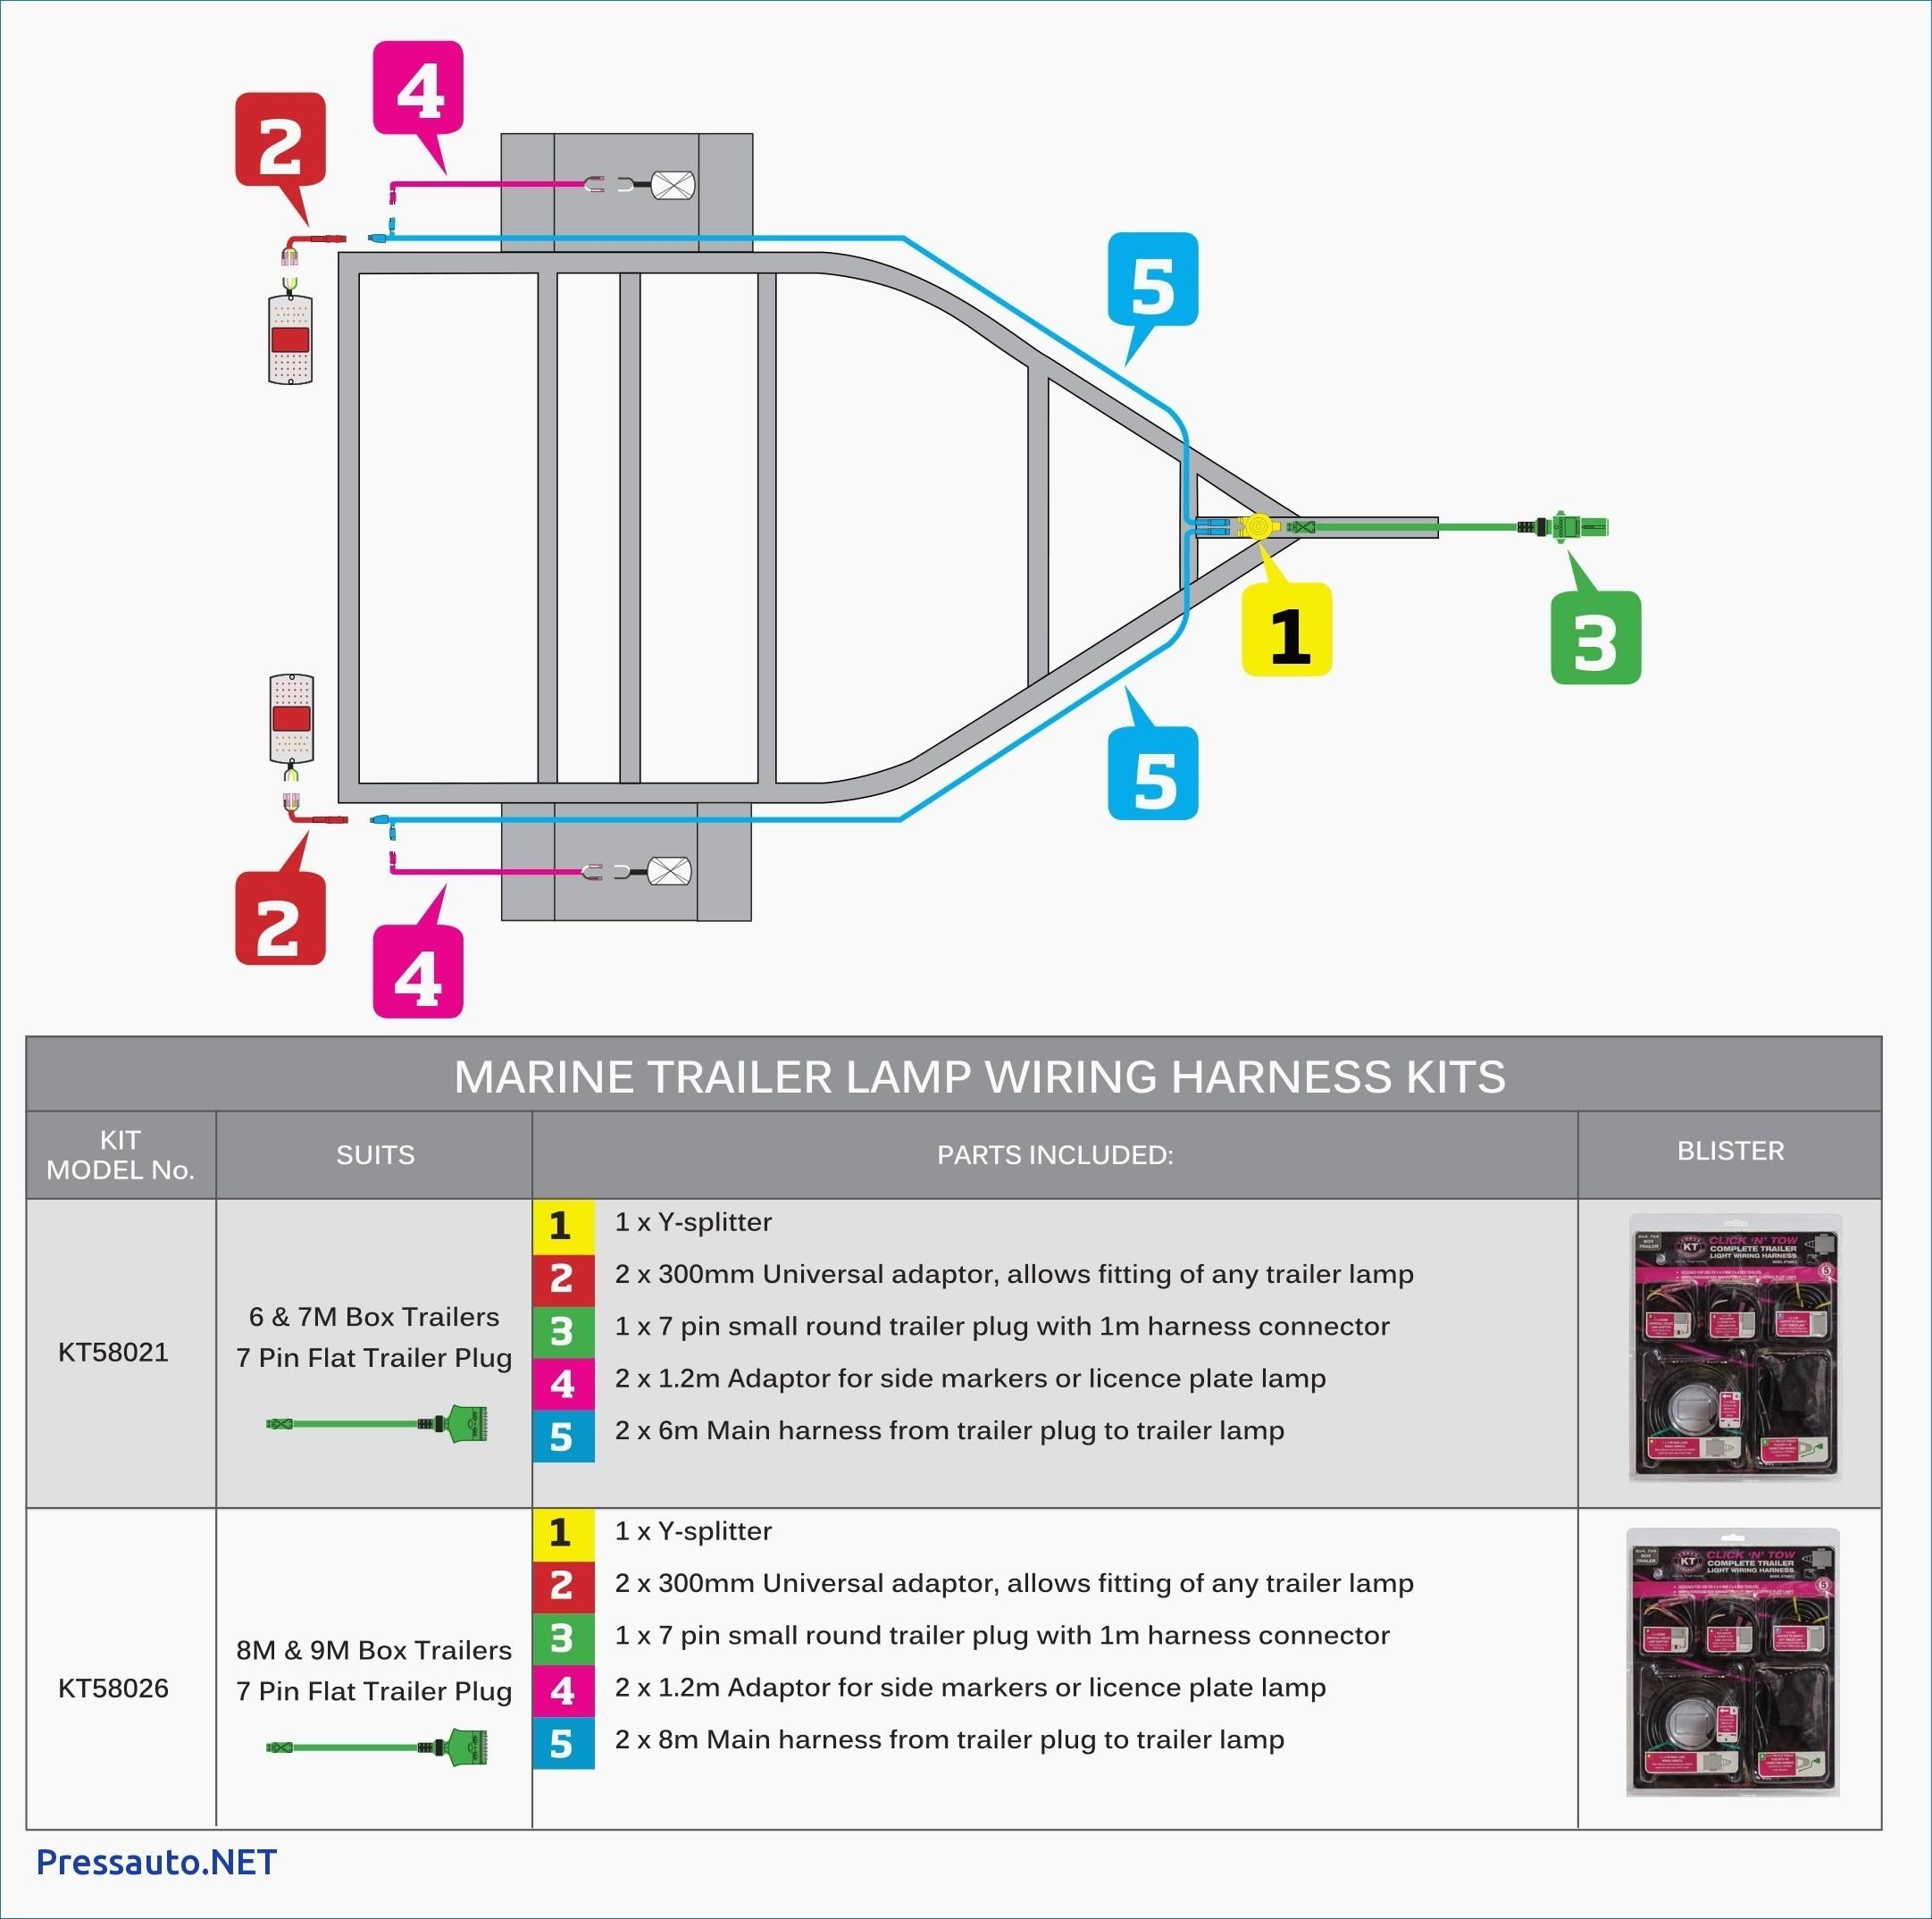 Caravan Wiring Diagram Australia Refrence 7 Wire Trailer Plug Diagram Inspirational Wiring Diagram Trailer